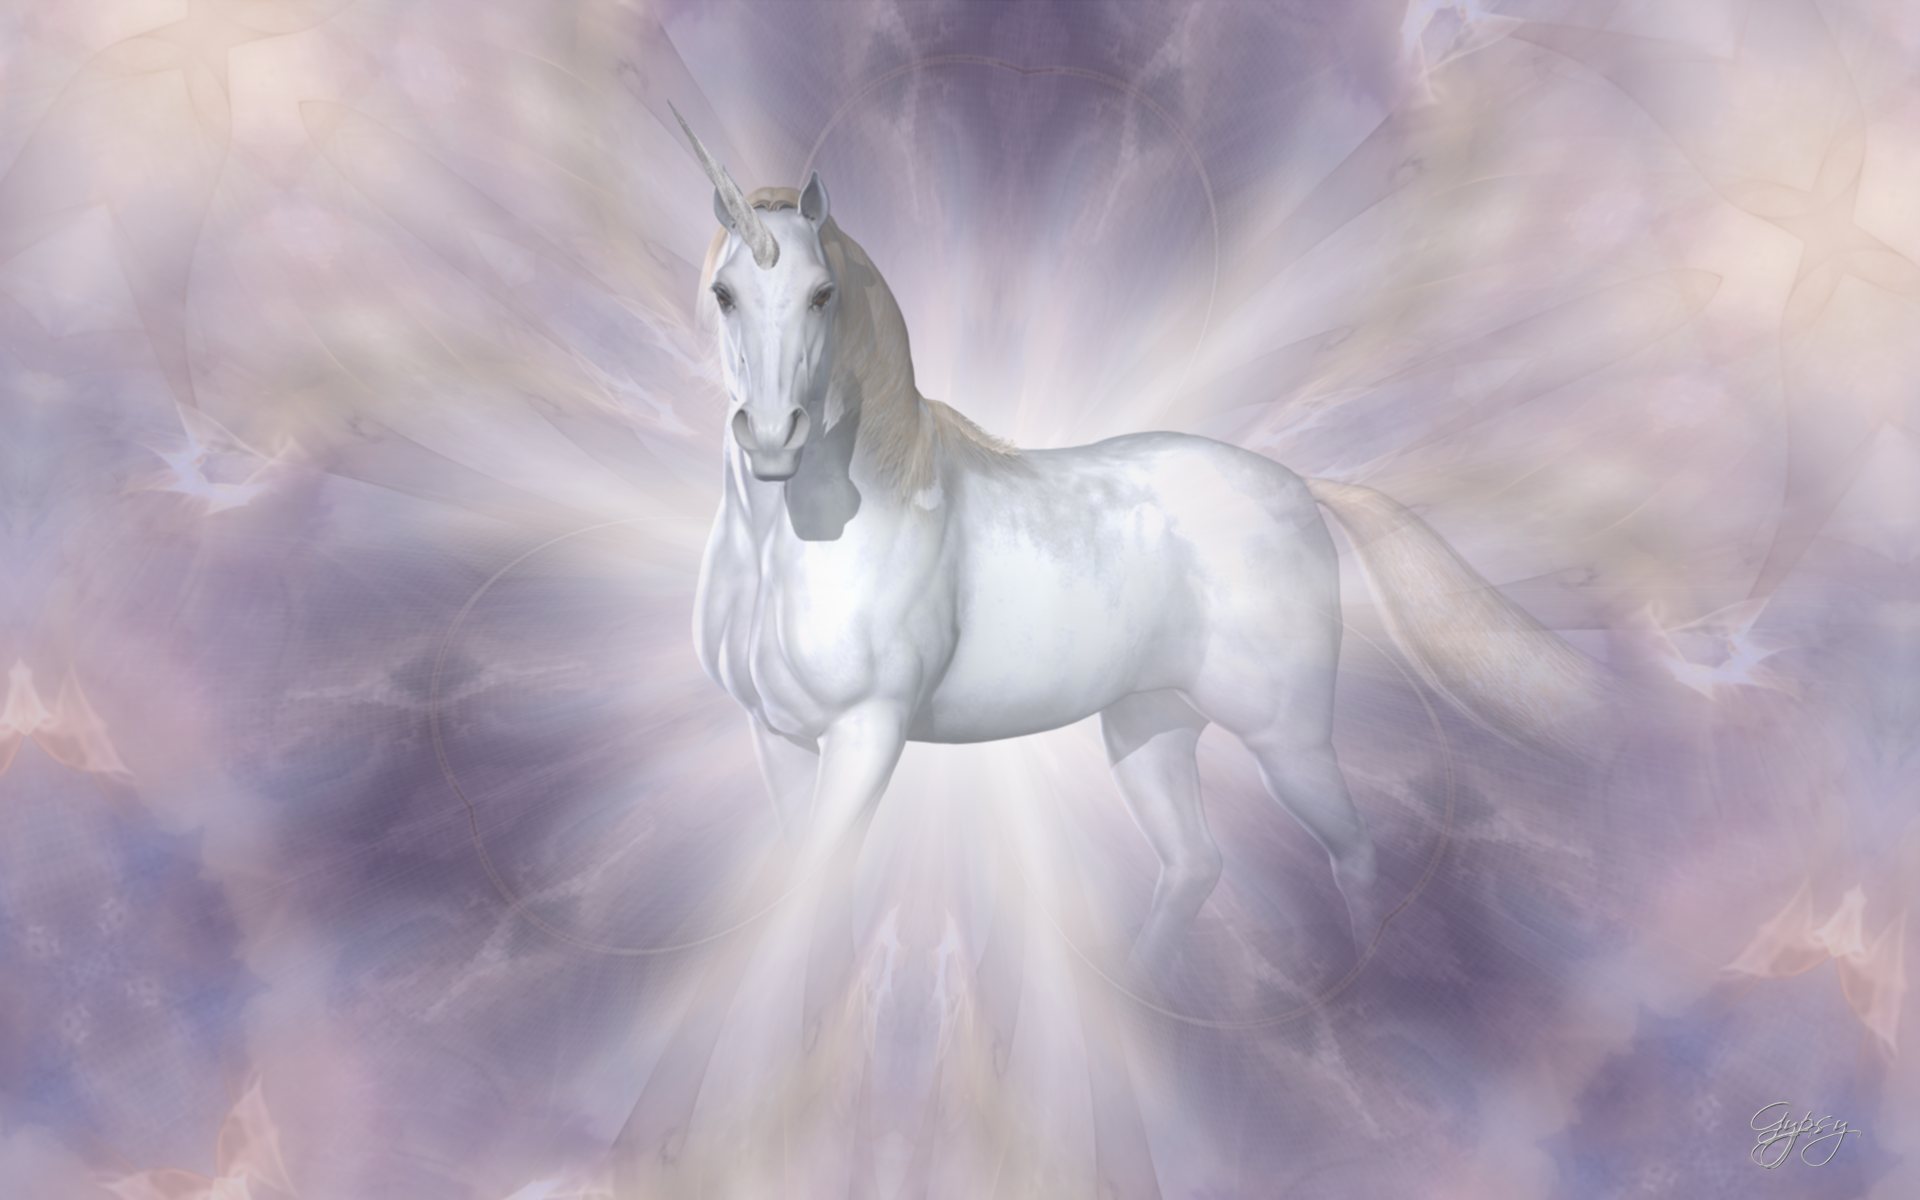 Best Wallpaper Horse Unicorn - f91994dcc079bcf34da83c9b91334482  Pic_288495.png